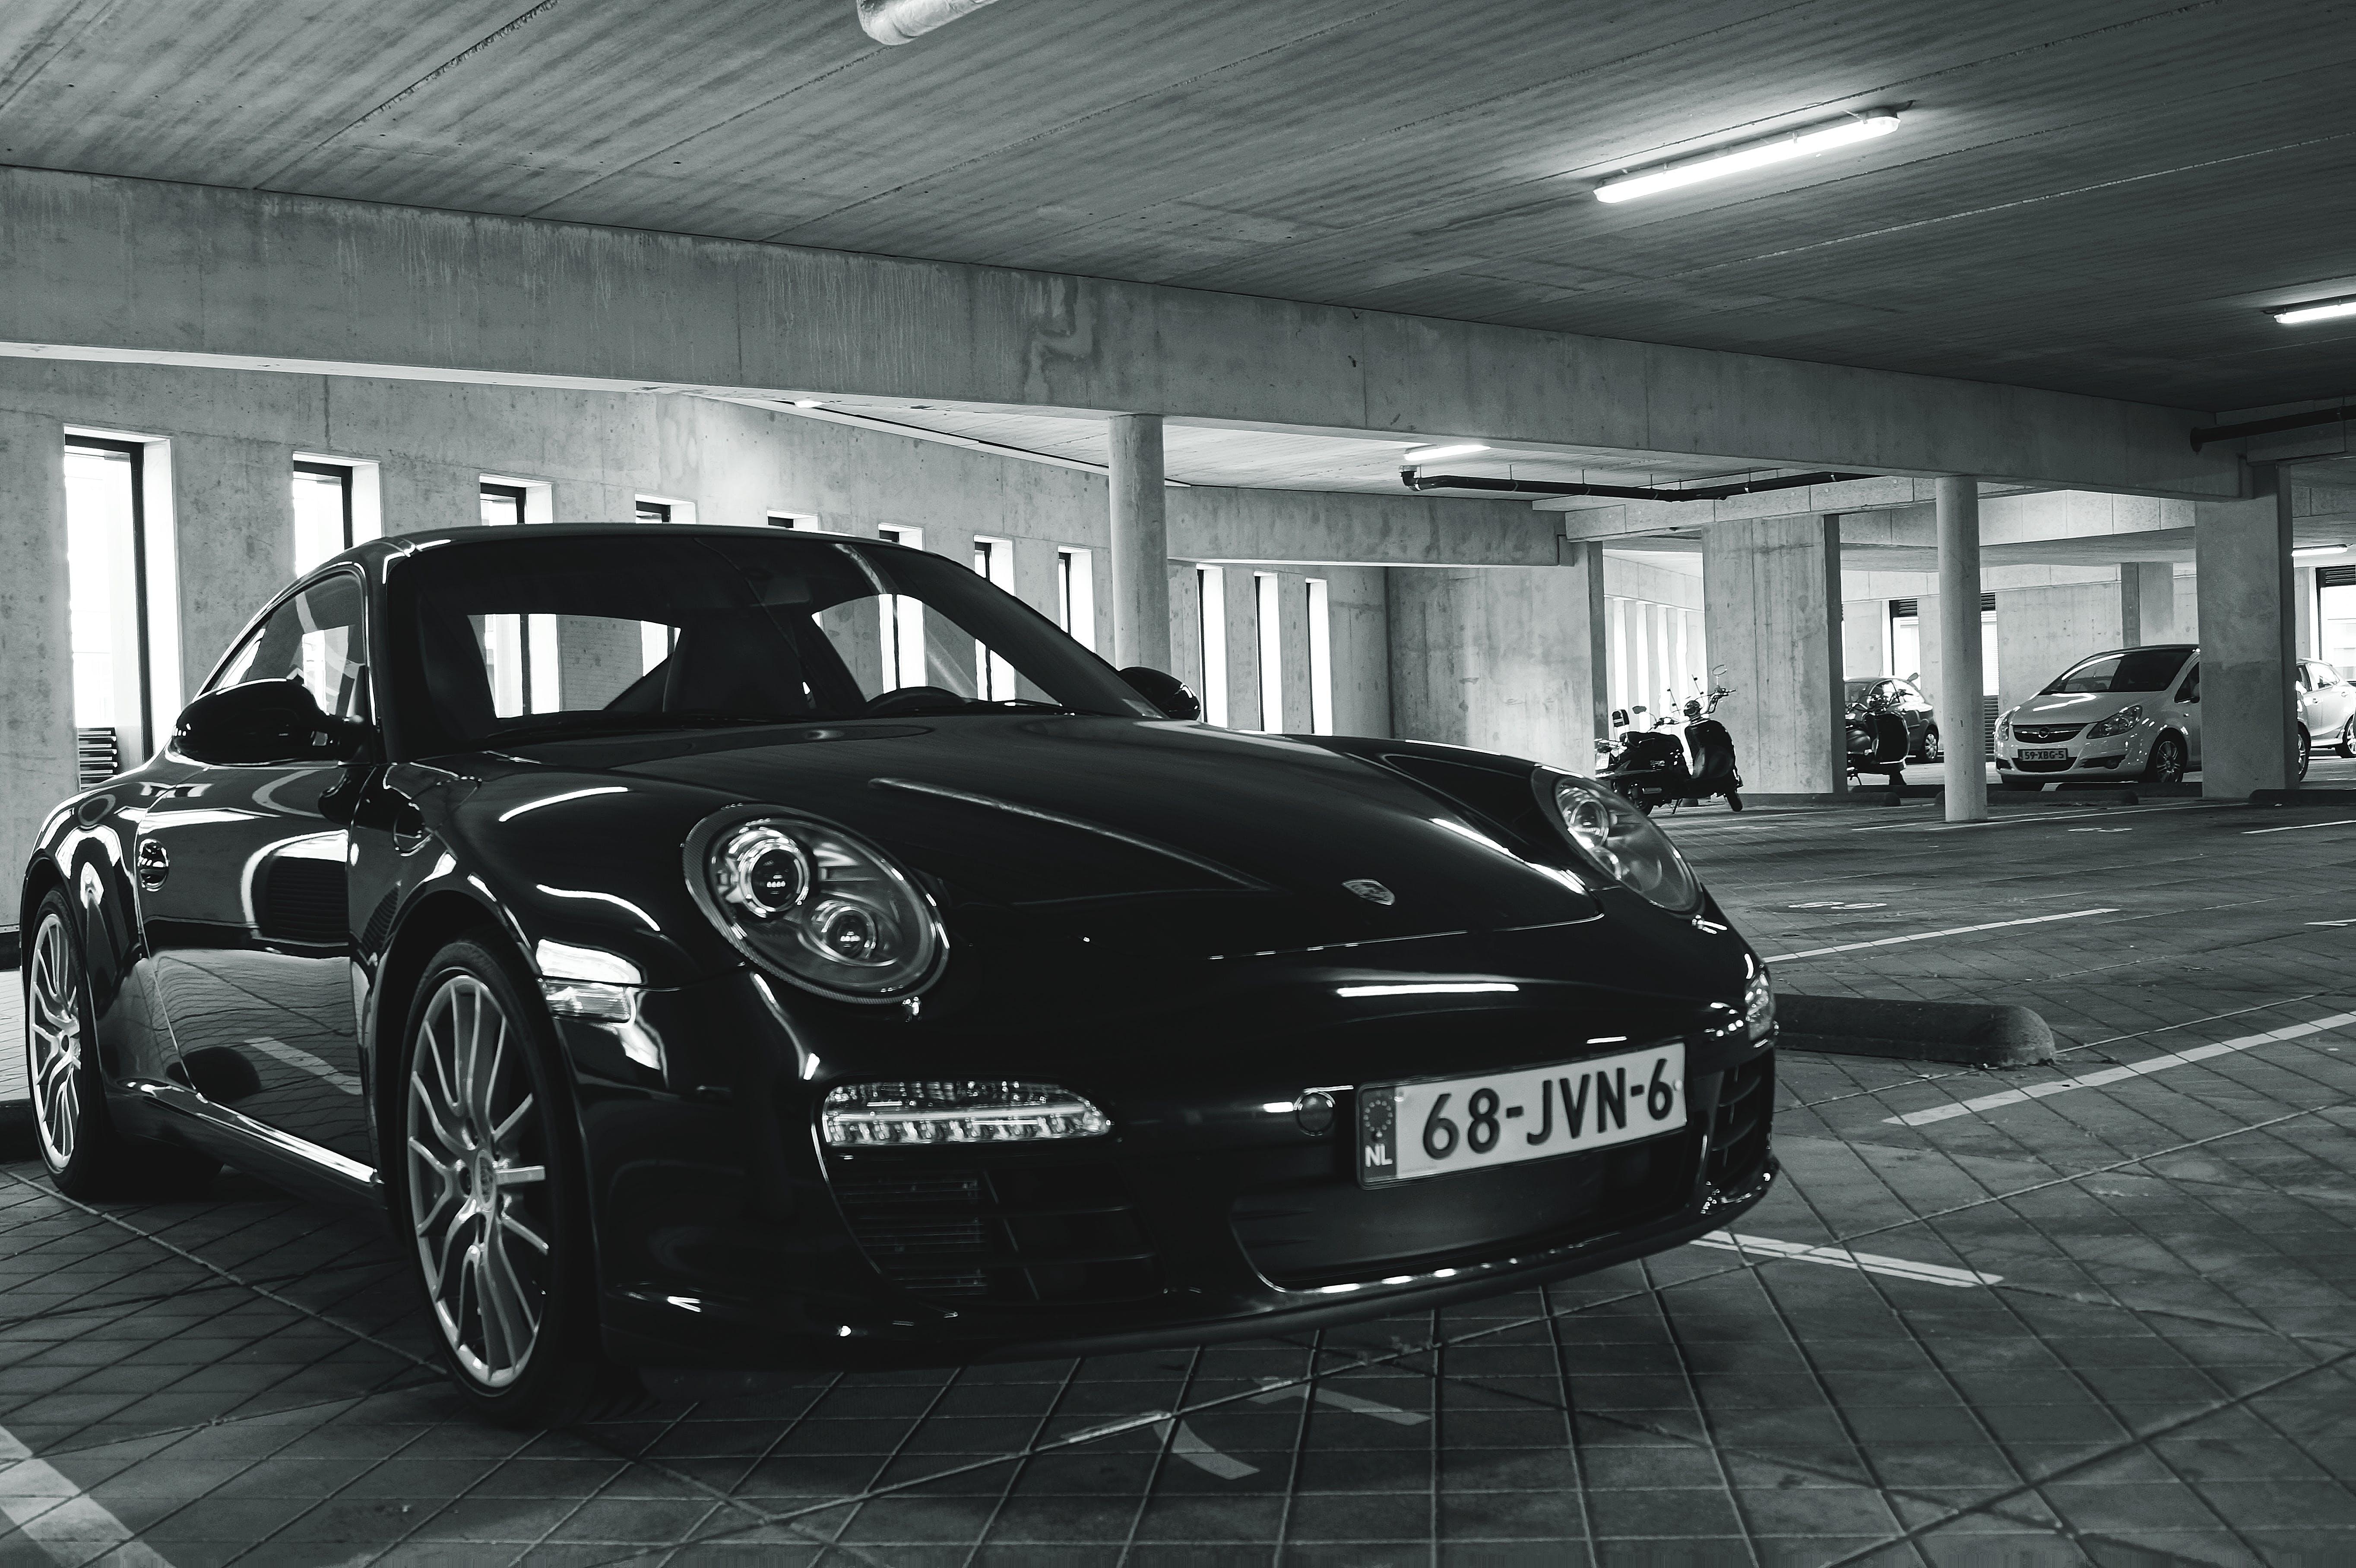 Free stock photo of black-and-white, cars, porsche, underground garage